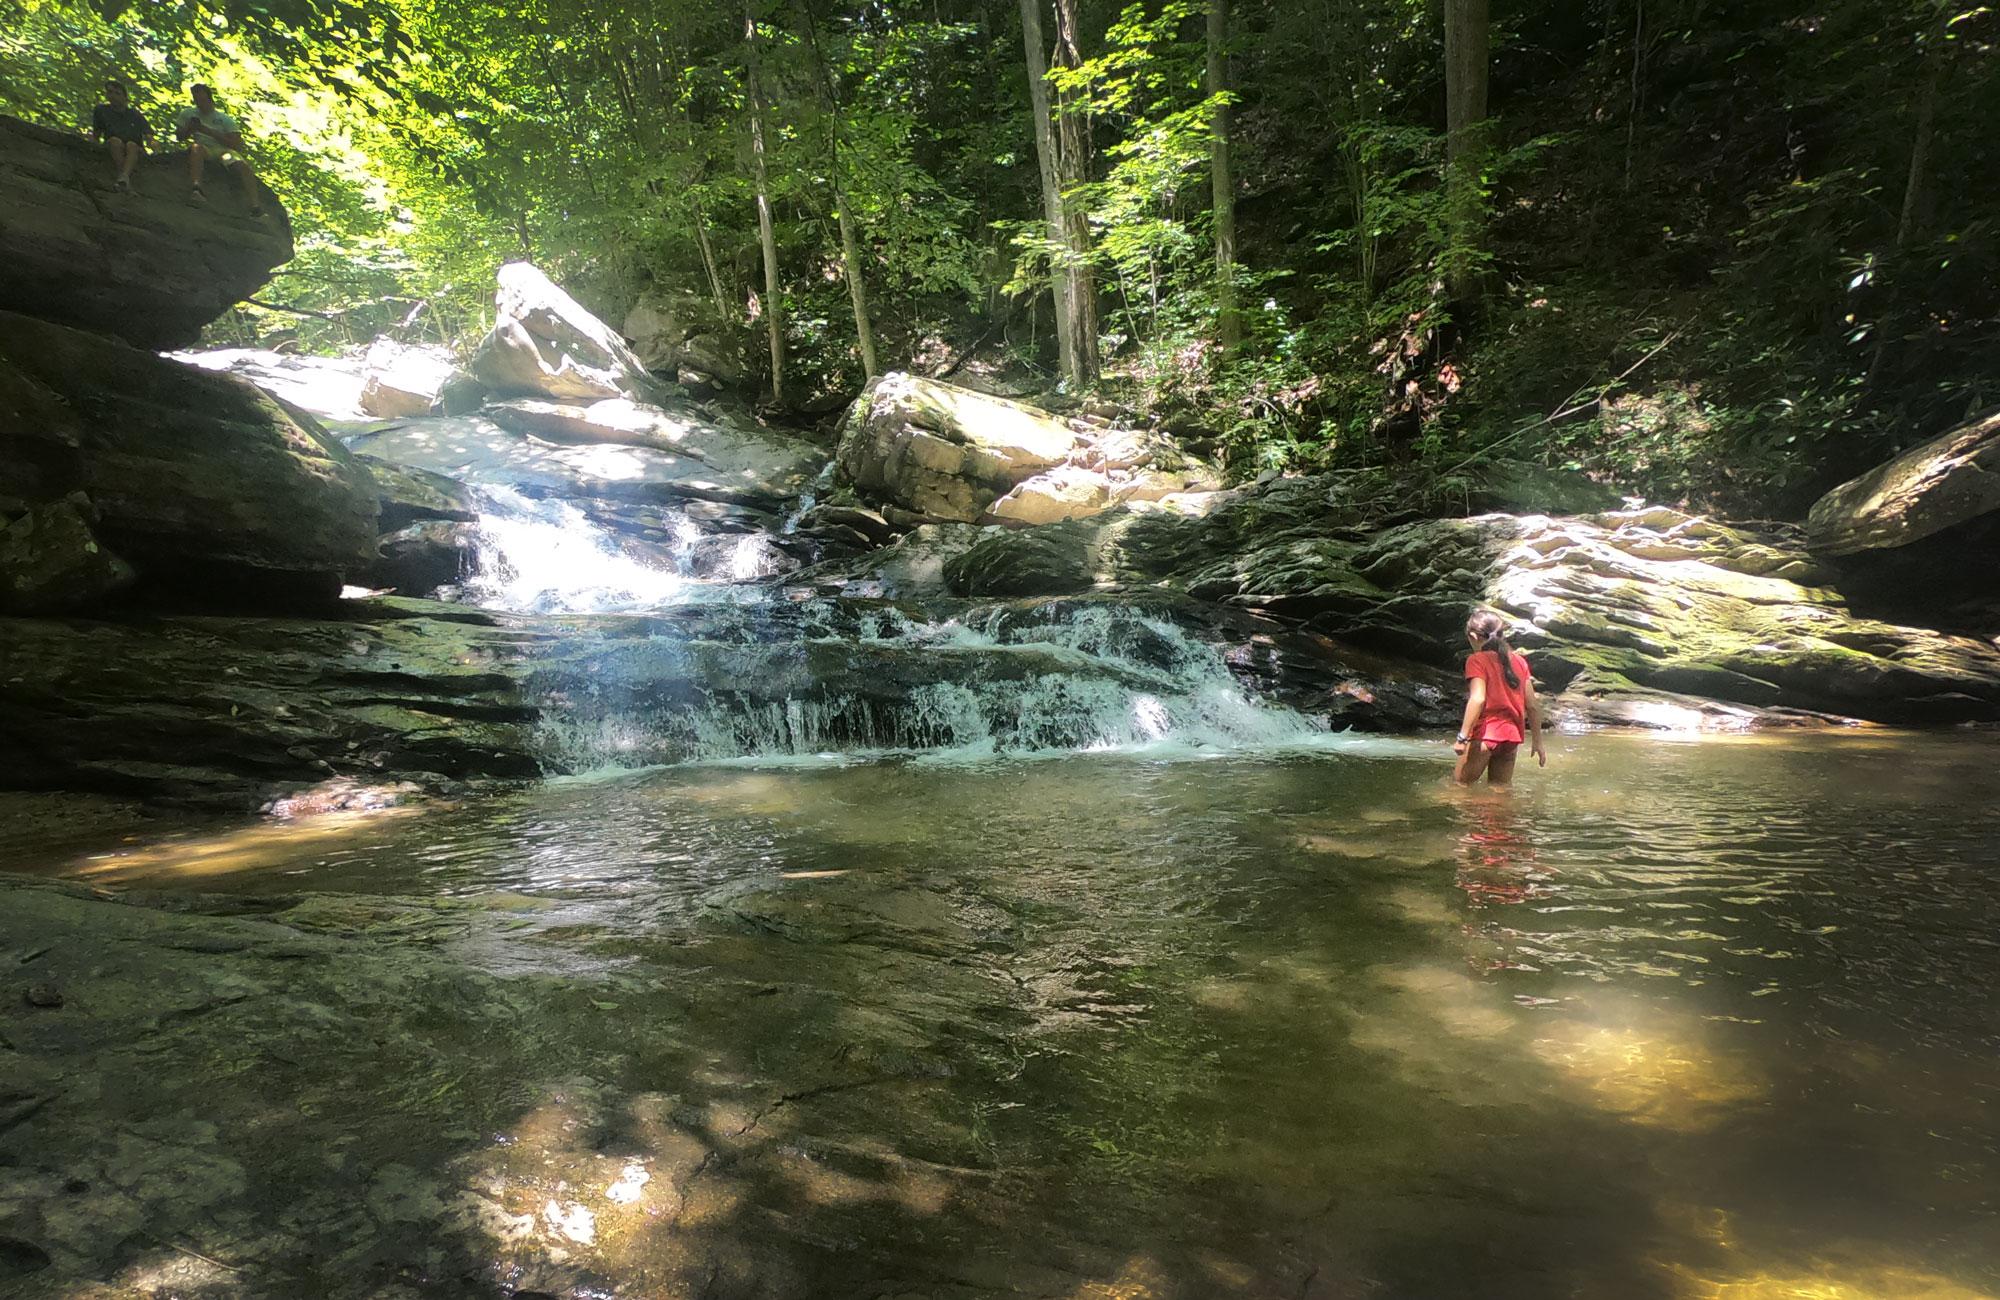 Girl wading in the Crab Orchard Falls, near Blue Ridge Parkway, North Carolina